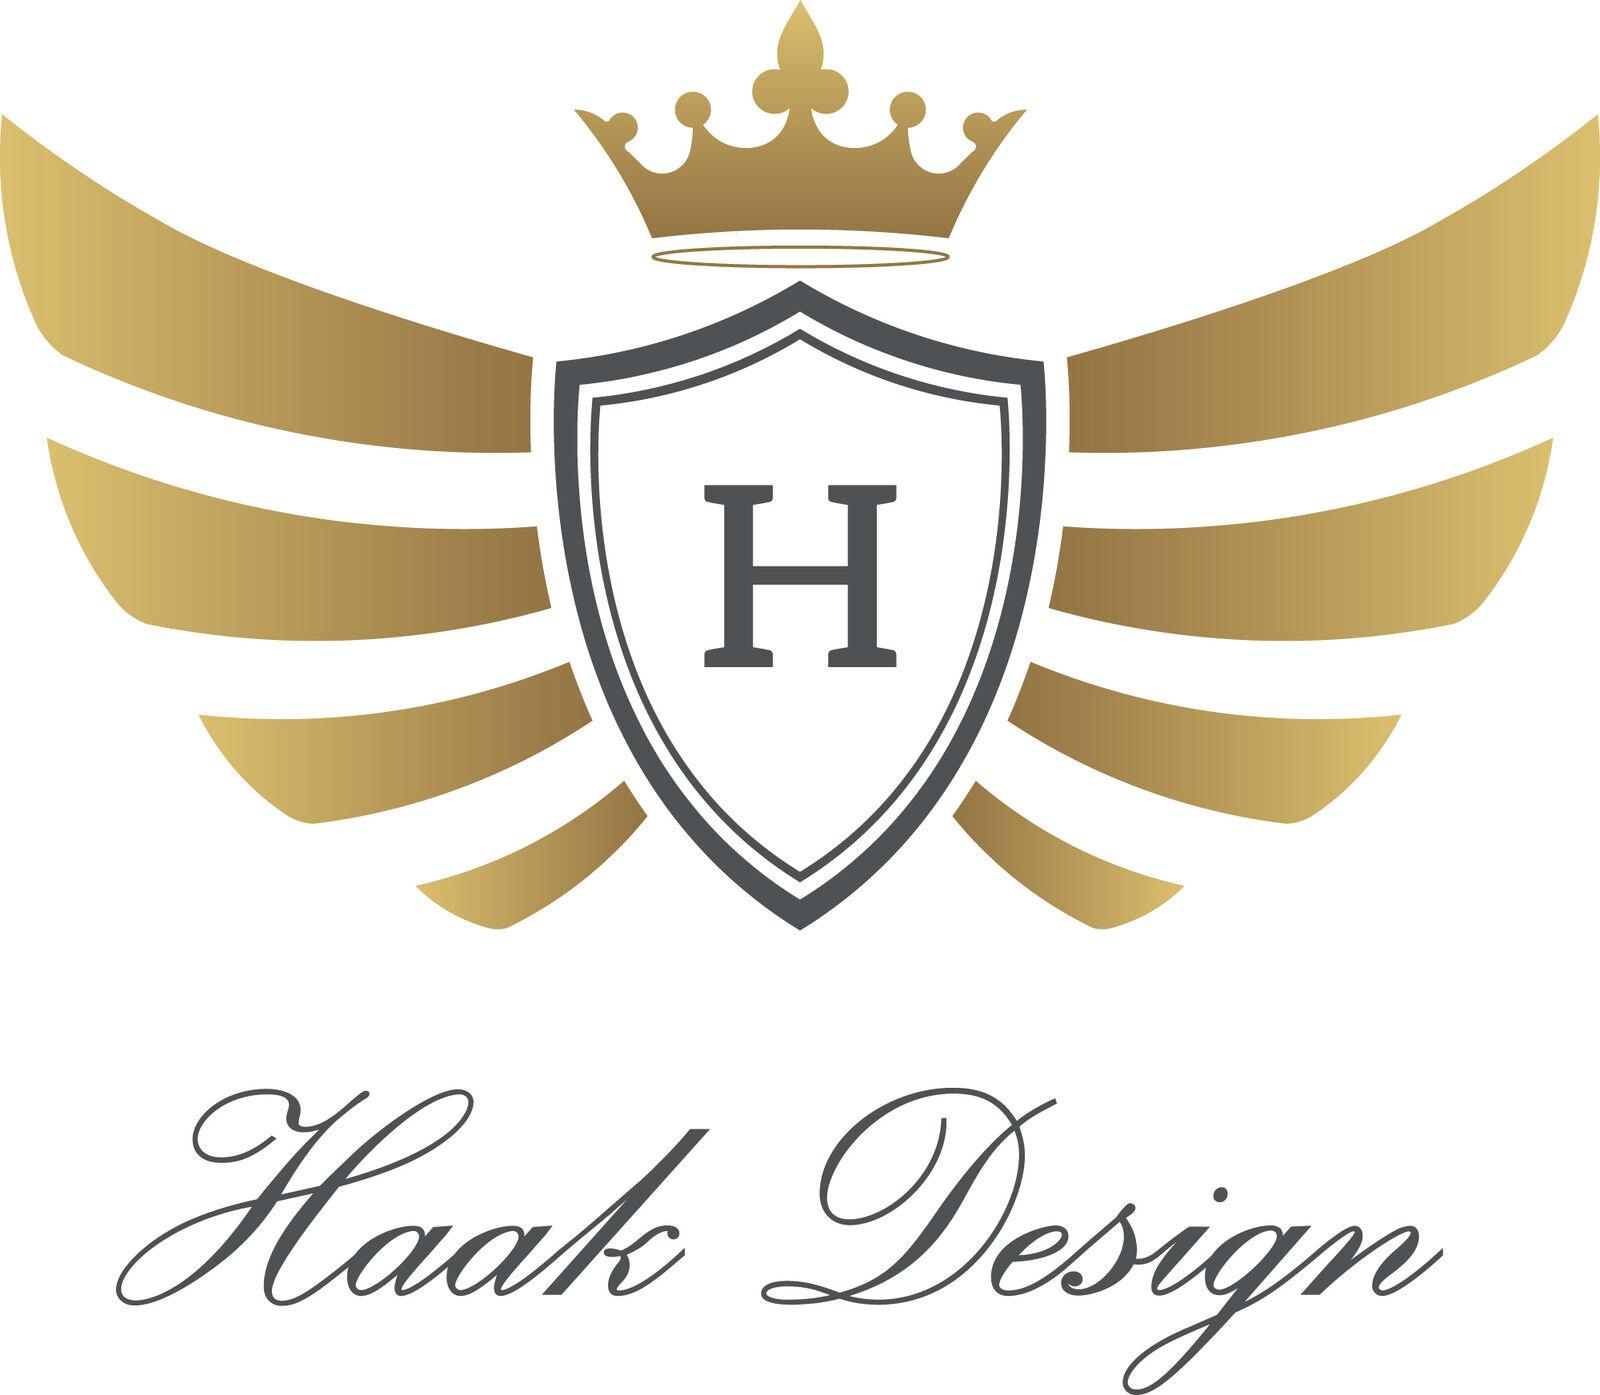 Haak Design